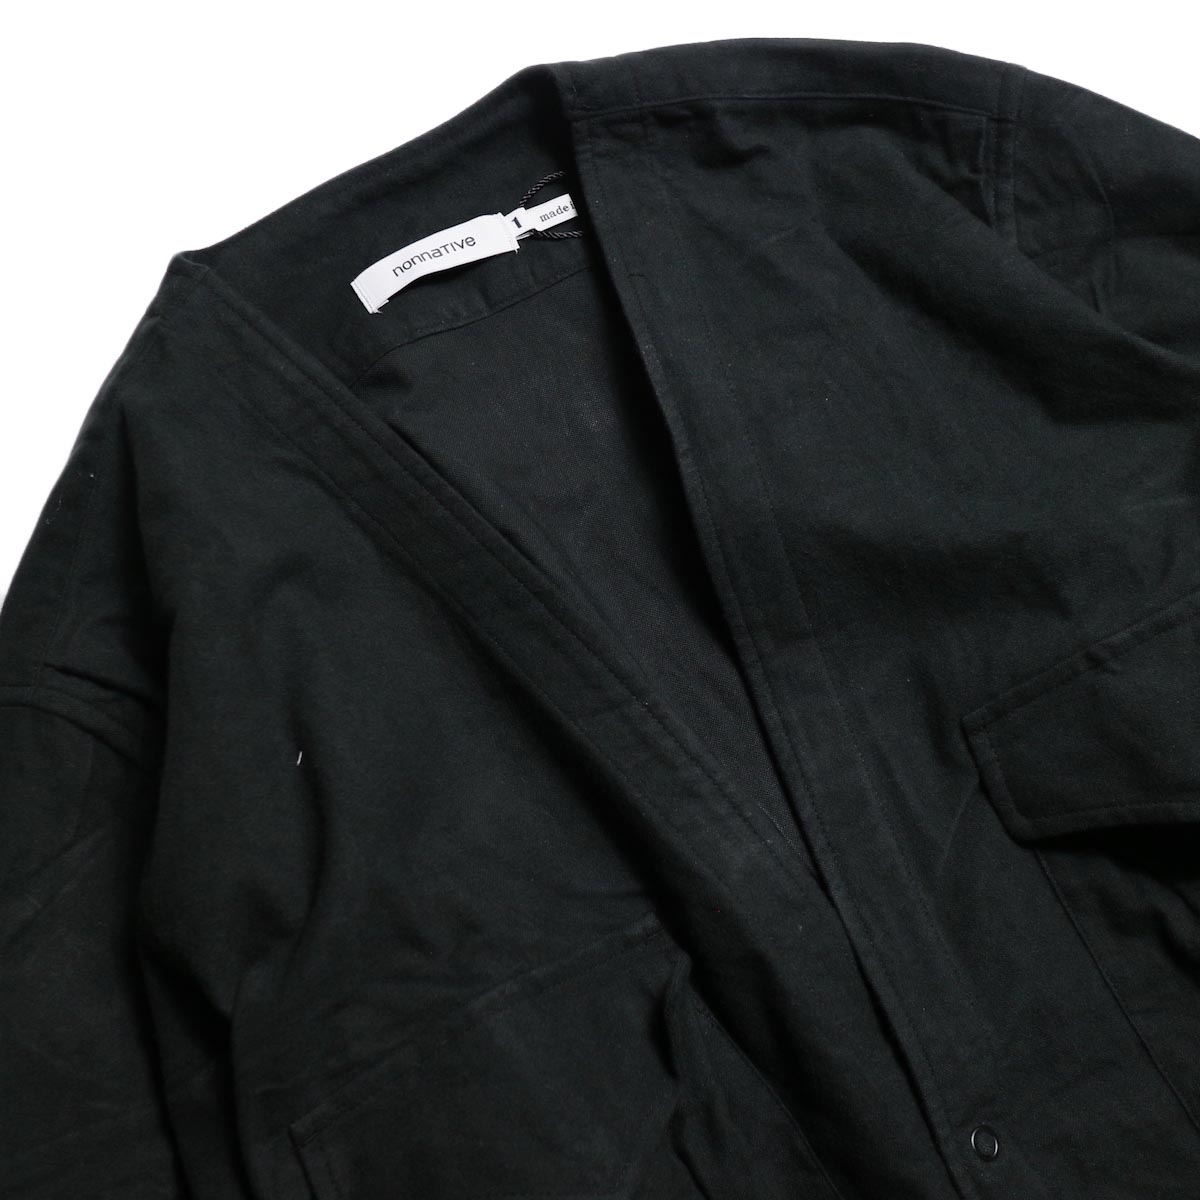 nonnative / CARPENTER SHIRT JACKET COTTON FLANNEL -Black 襟